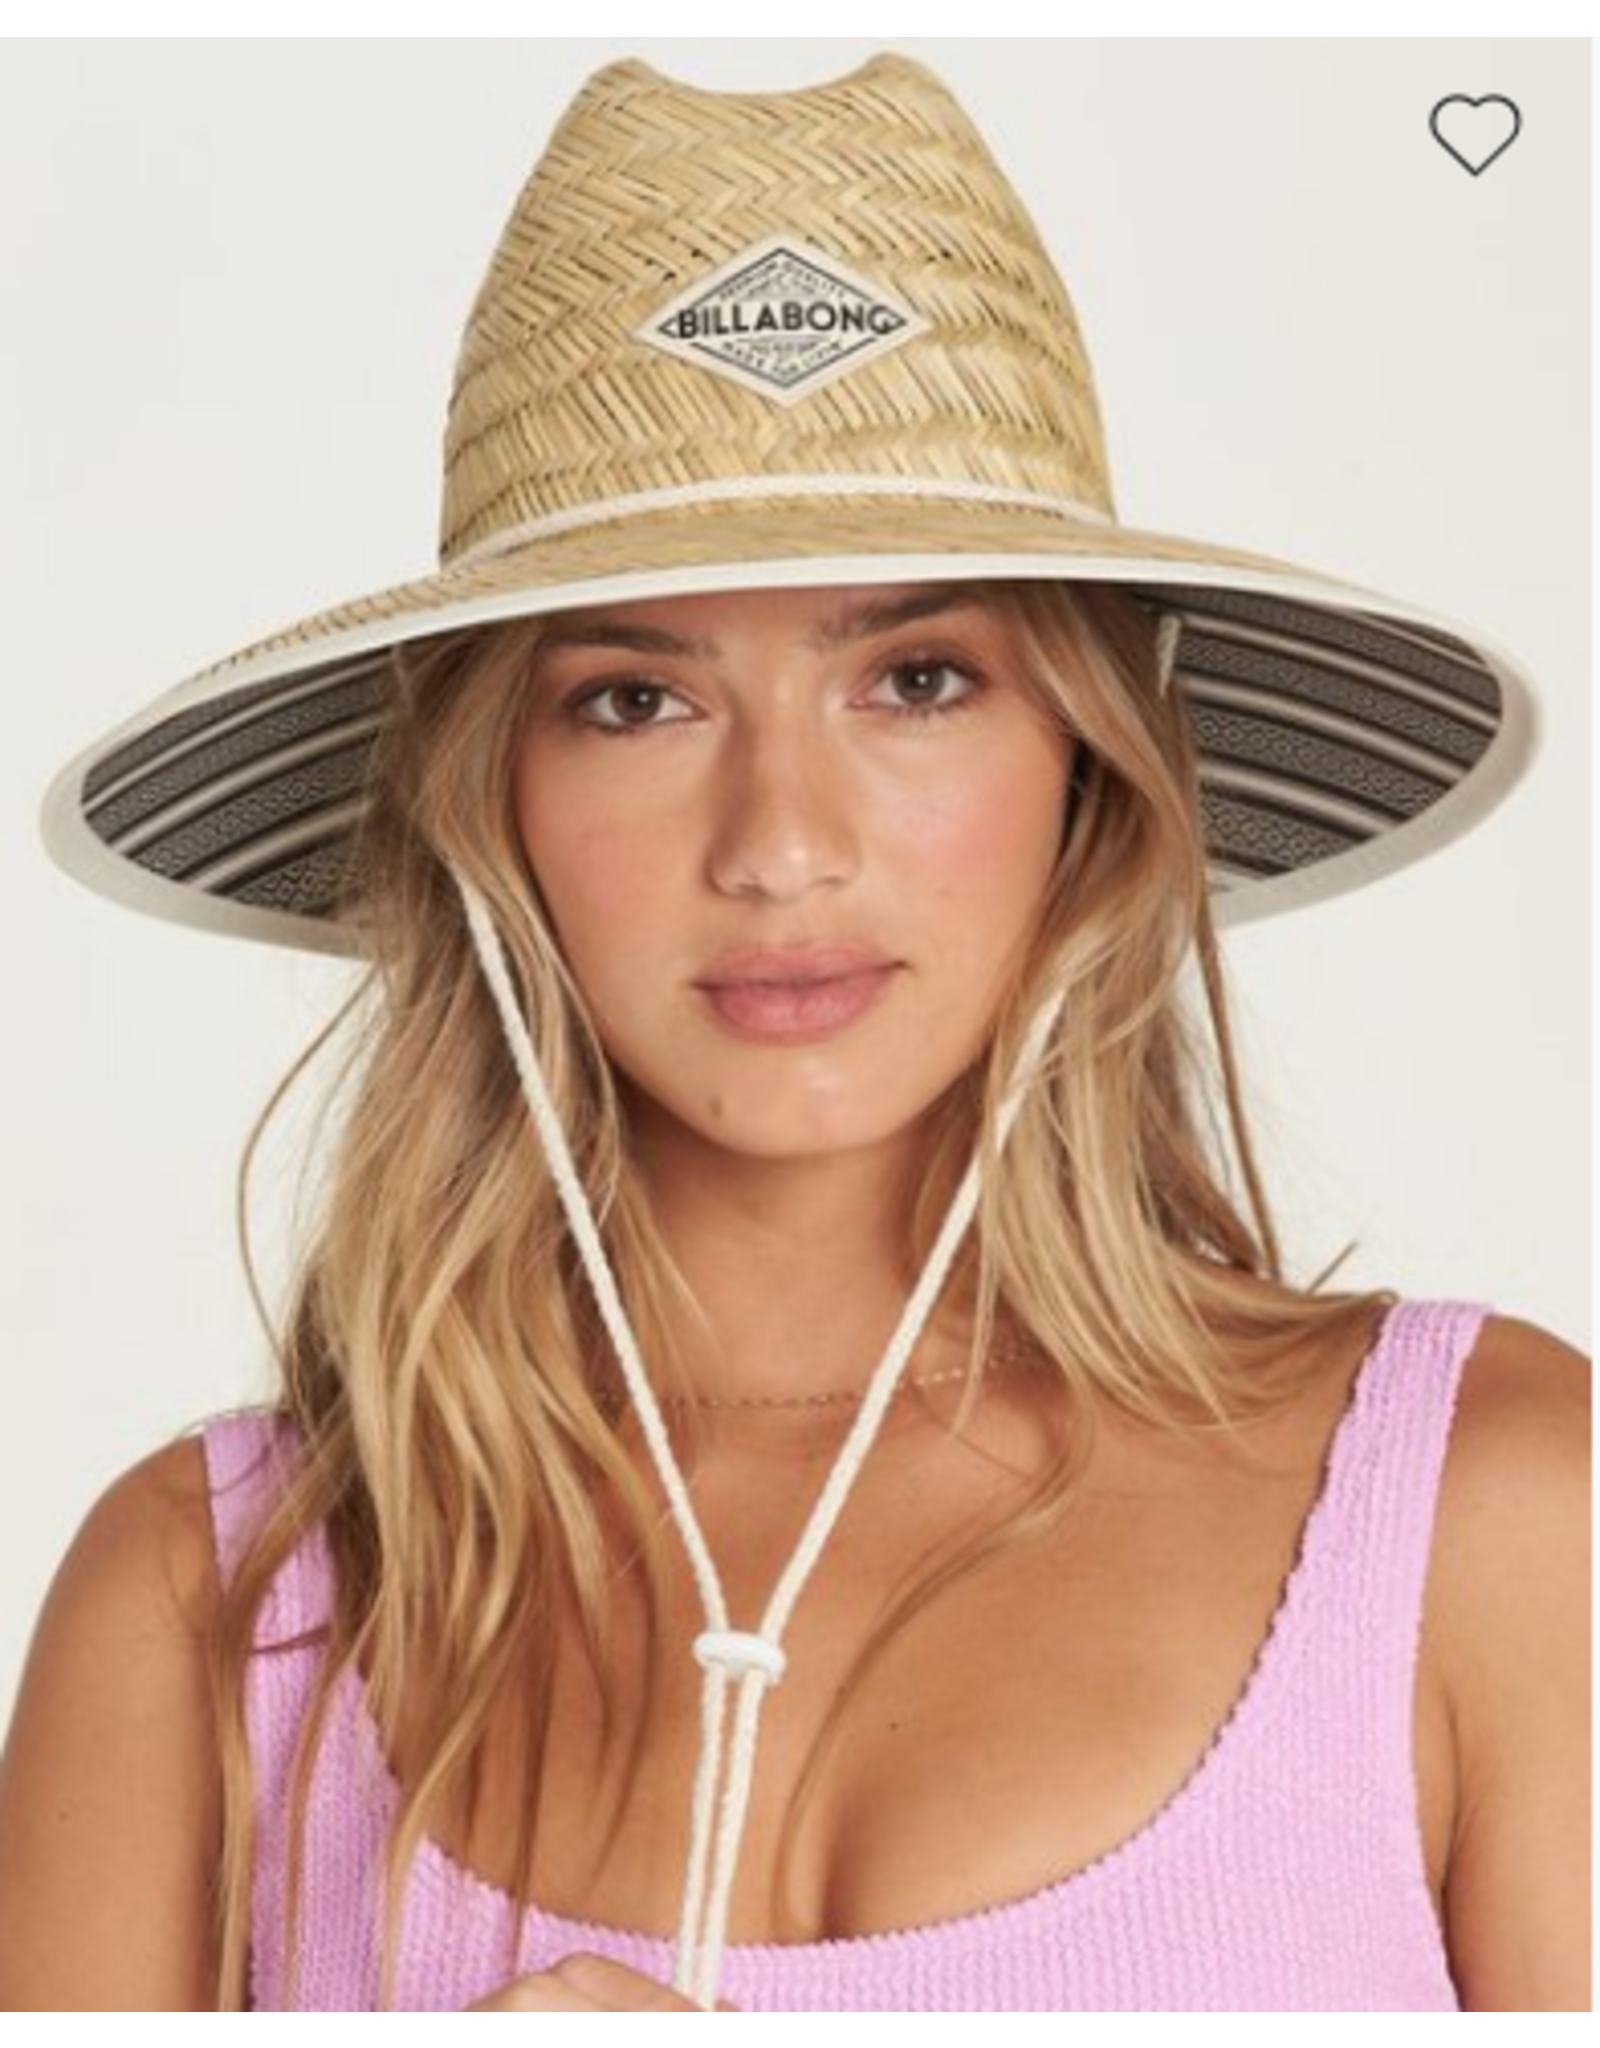 BILLABONG BILLABONG TIPTON STRAW HAT